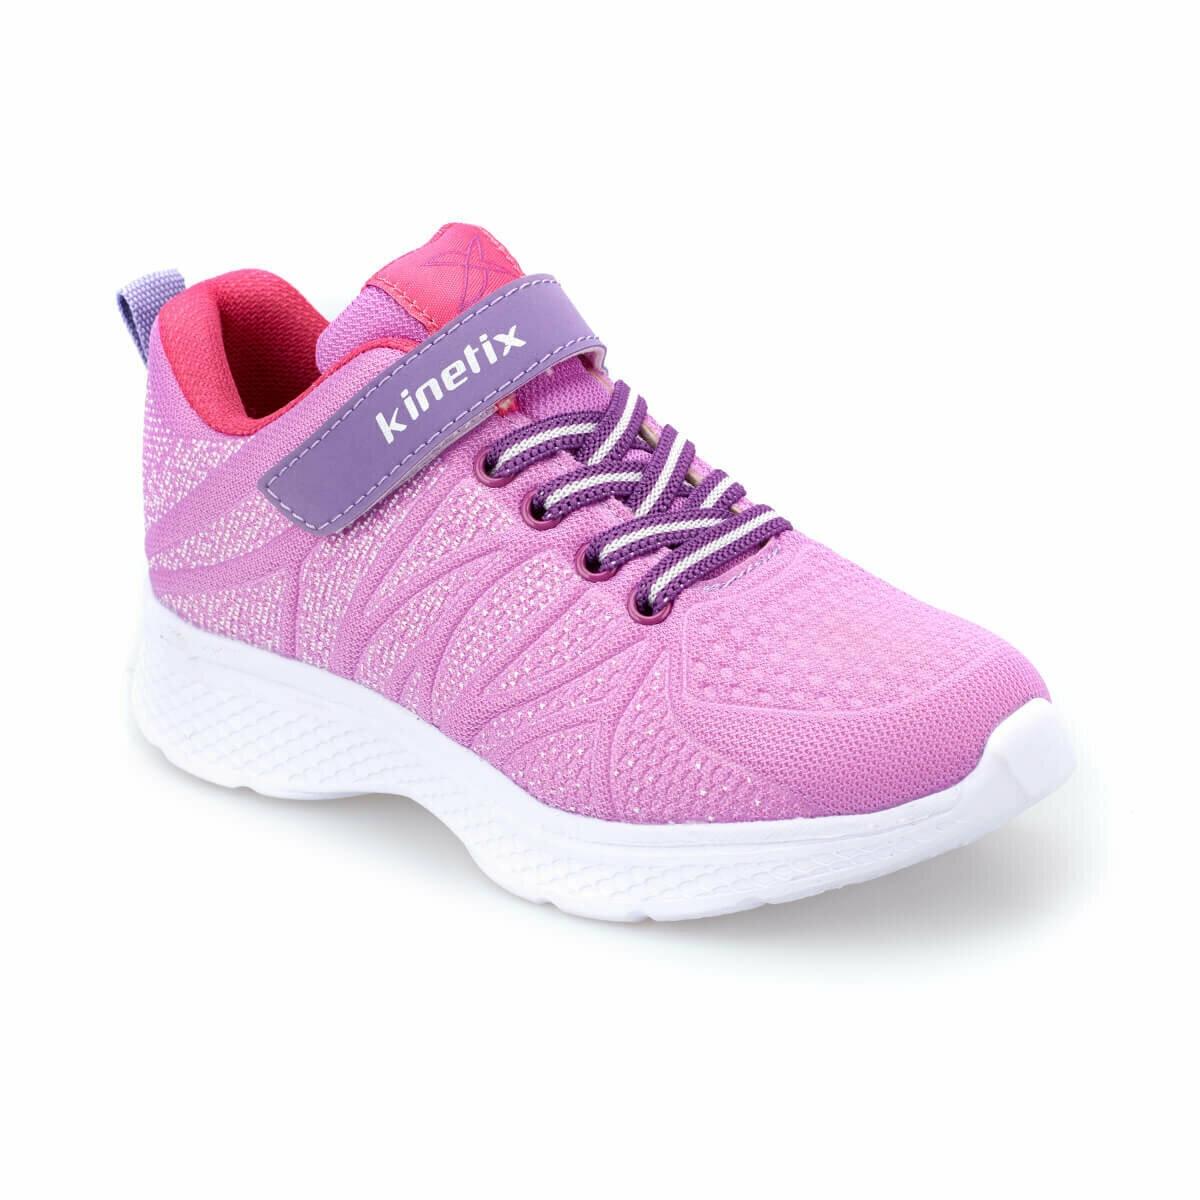 FLO MAMBA Lilac Female Child Sneaker Shoes KINETIX